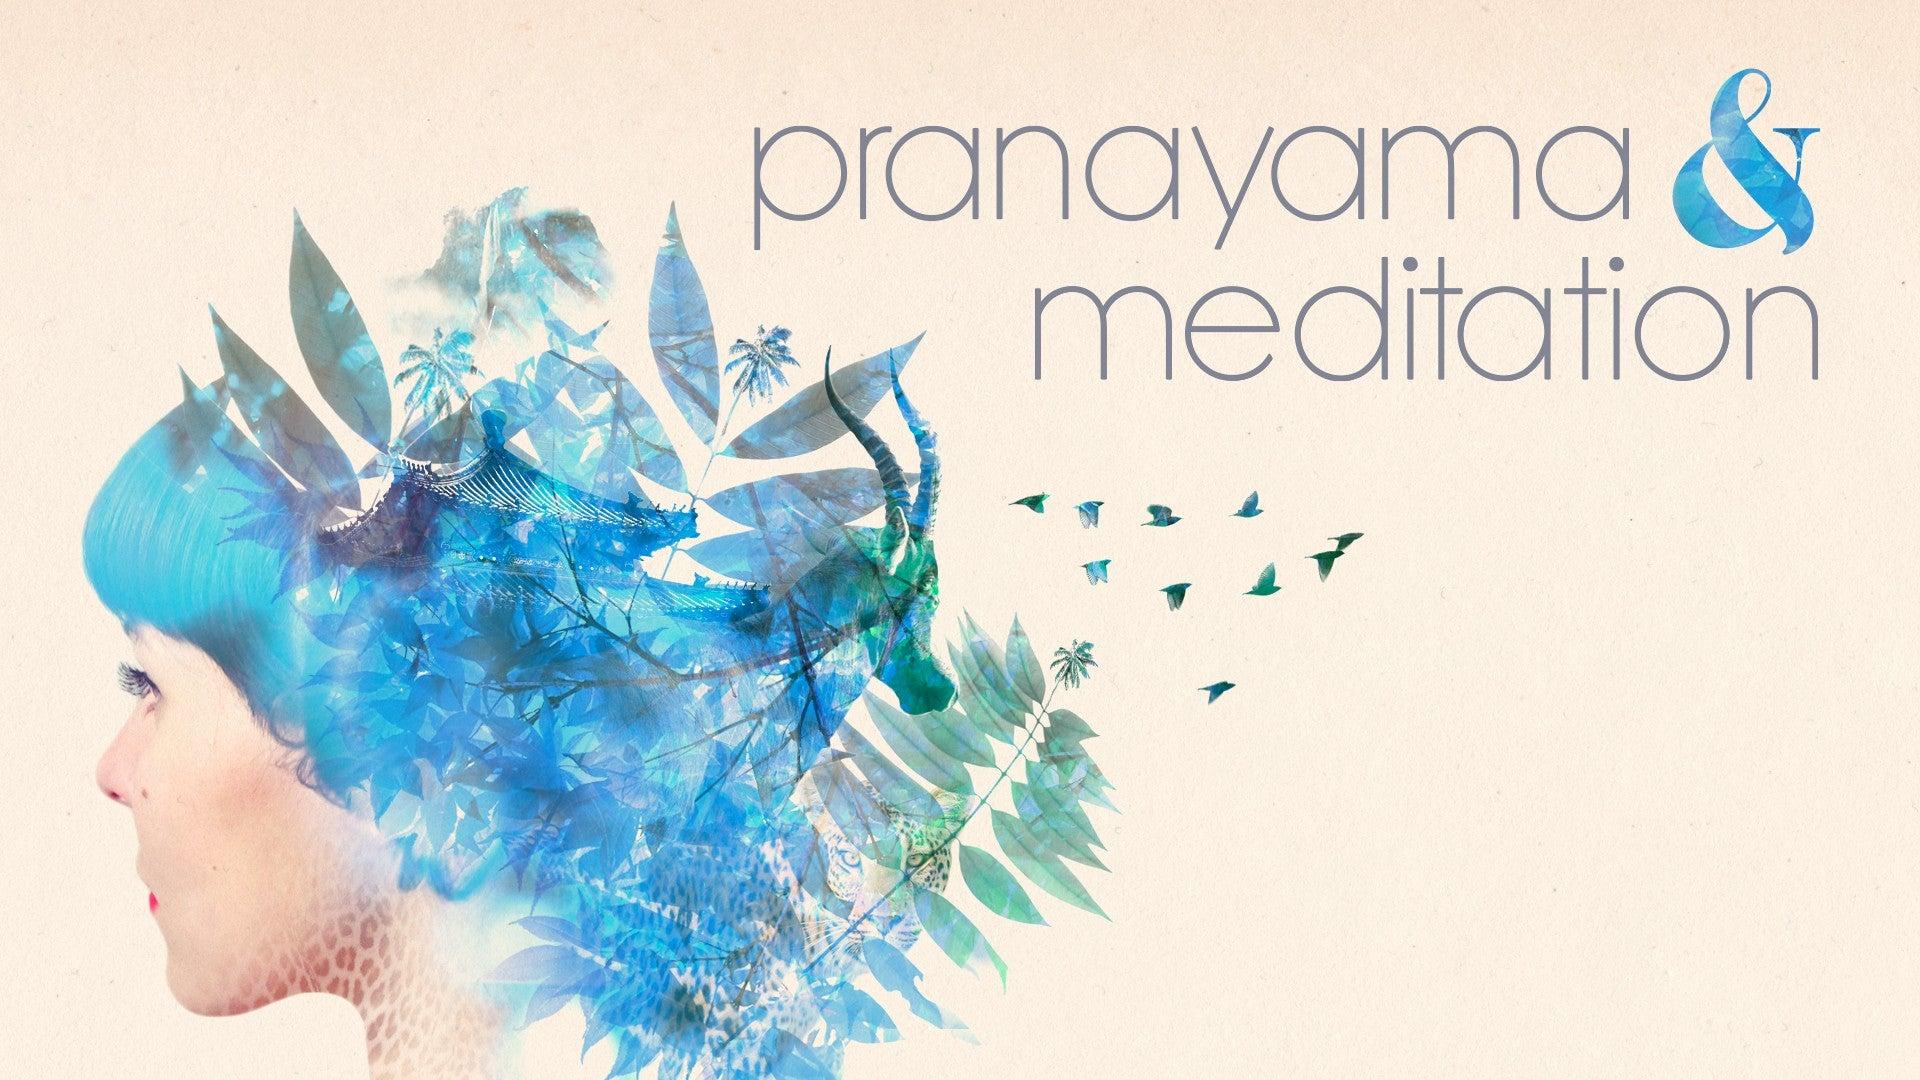 Pranayama & Meditation Artwork